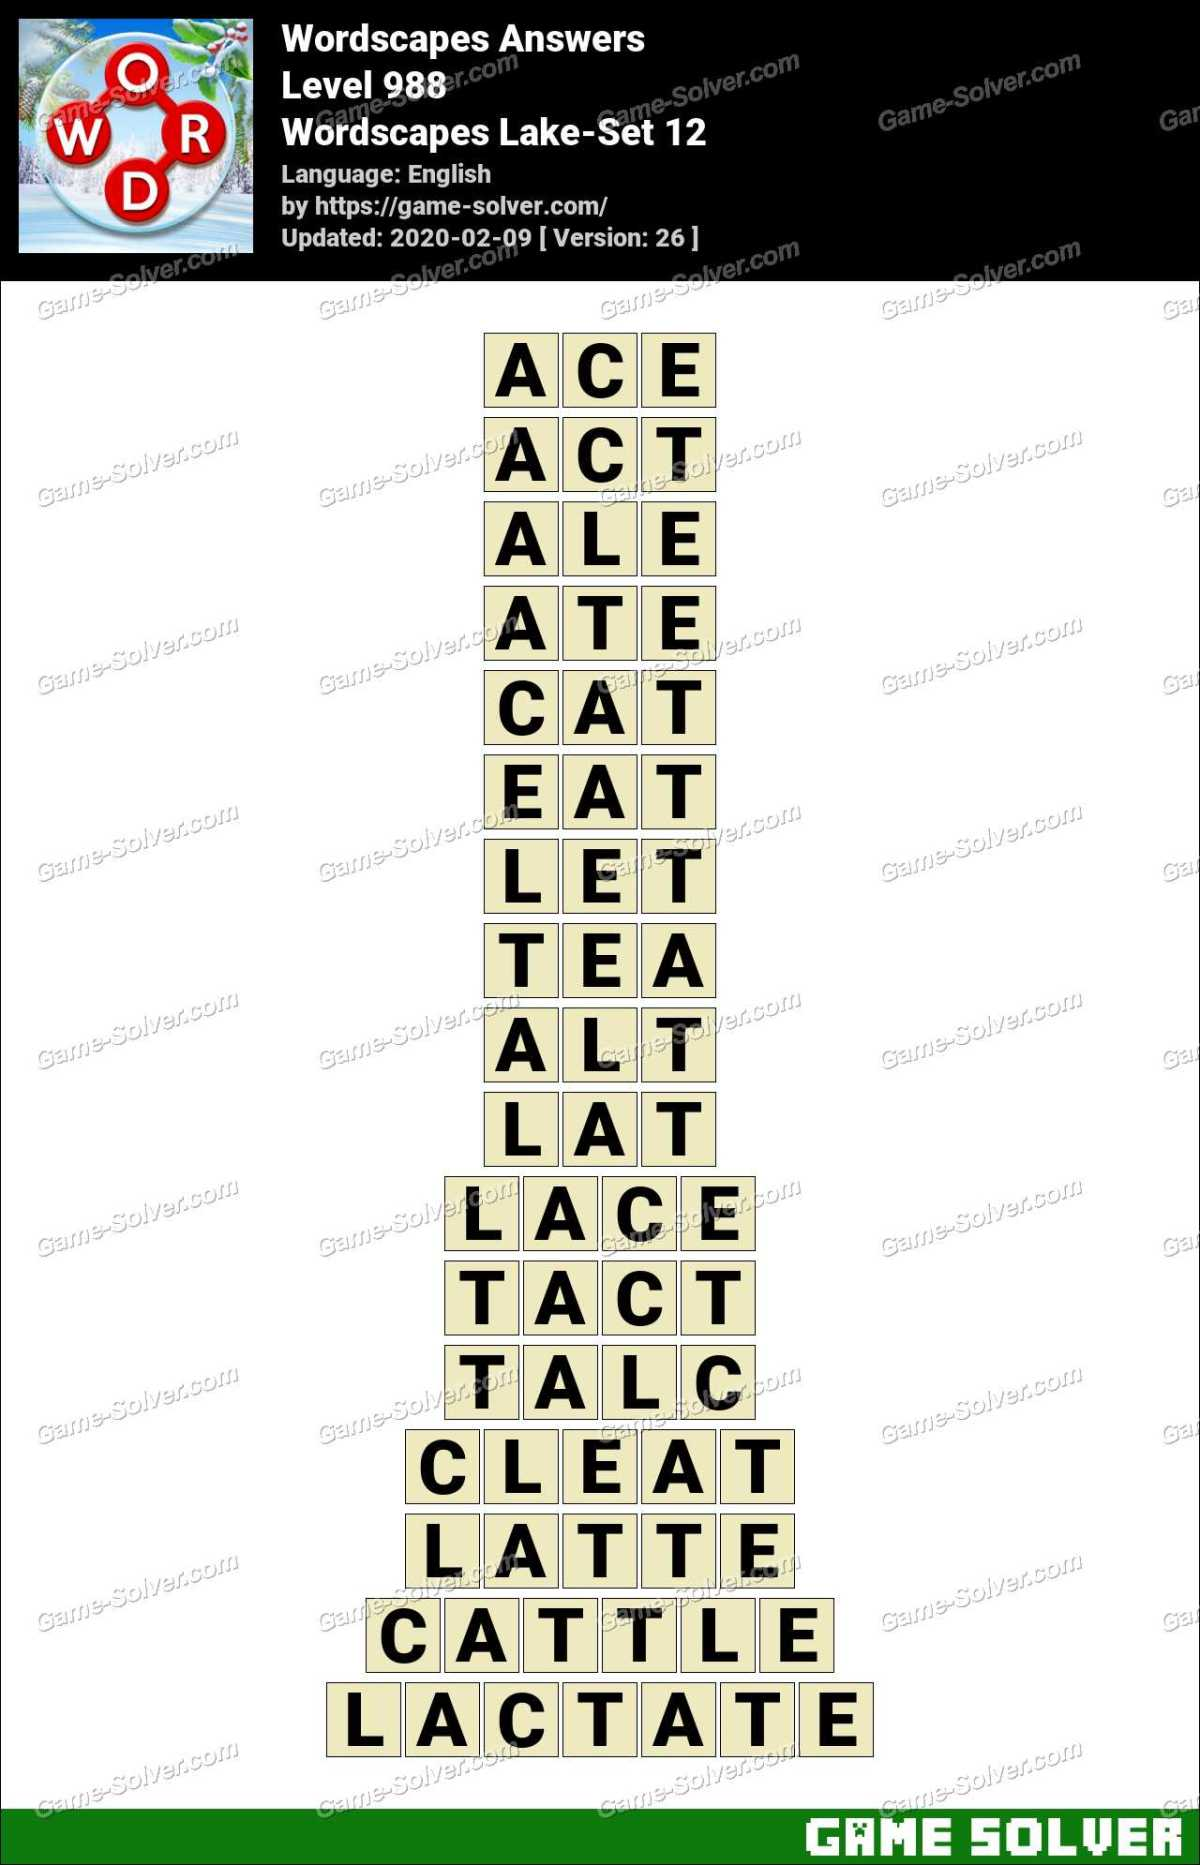 Wordscapes Lake-Set 12 Answers